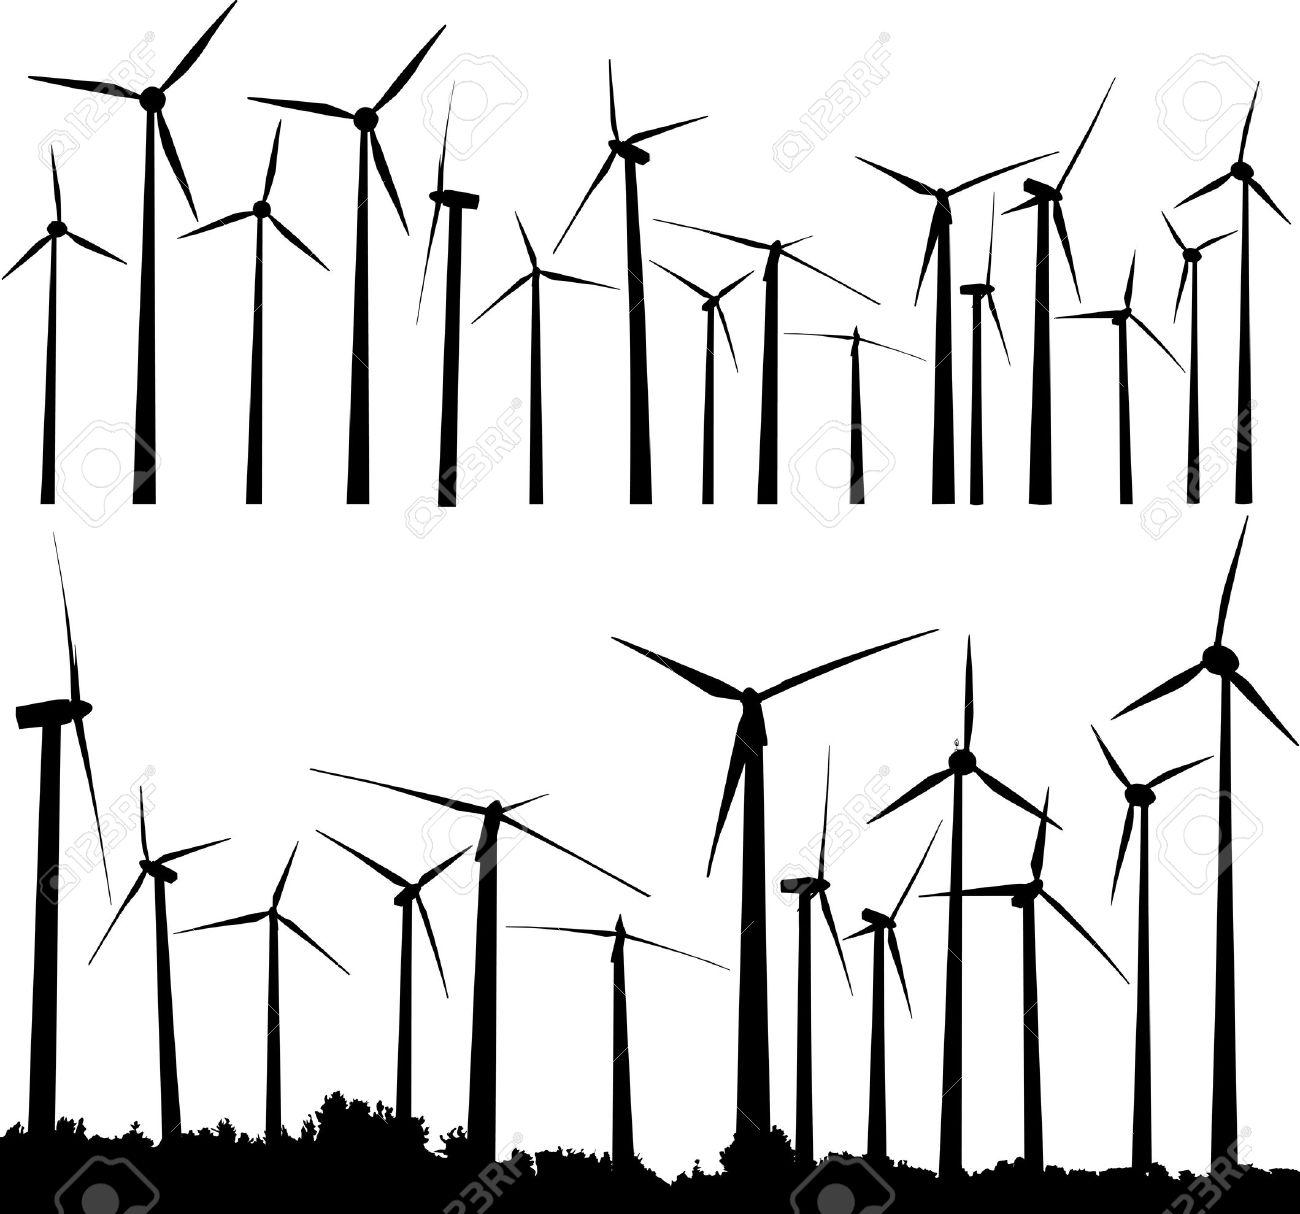 Vector Silhouette Of Wind Generators Or Turbines Royalty Free Diagram Also Power Generator Diagrams On Turbine